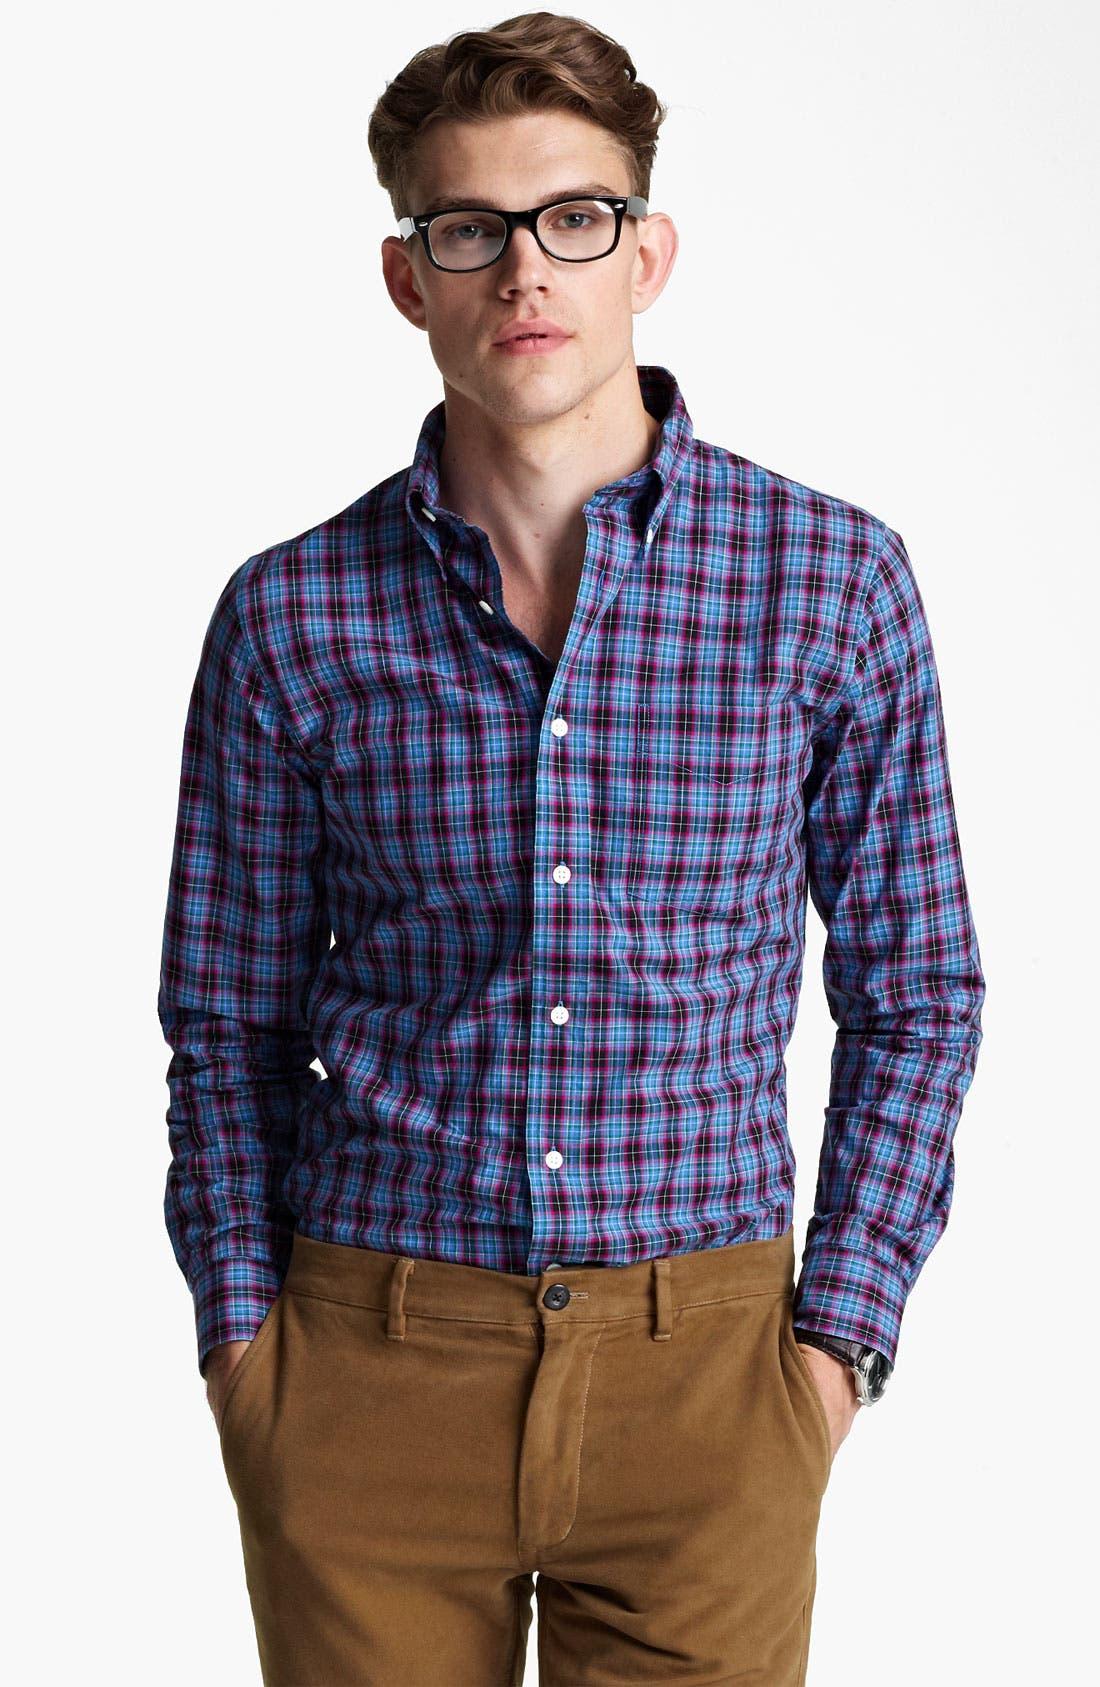 Main Image - Jack Spade 'Arnet' Check Woven Shirt